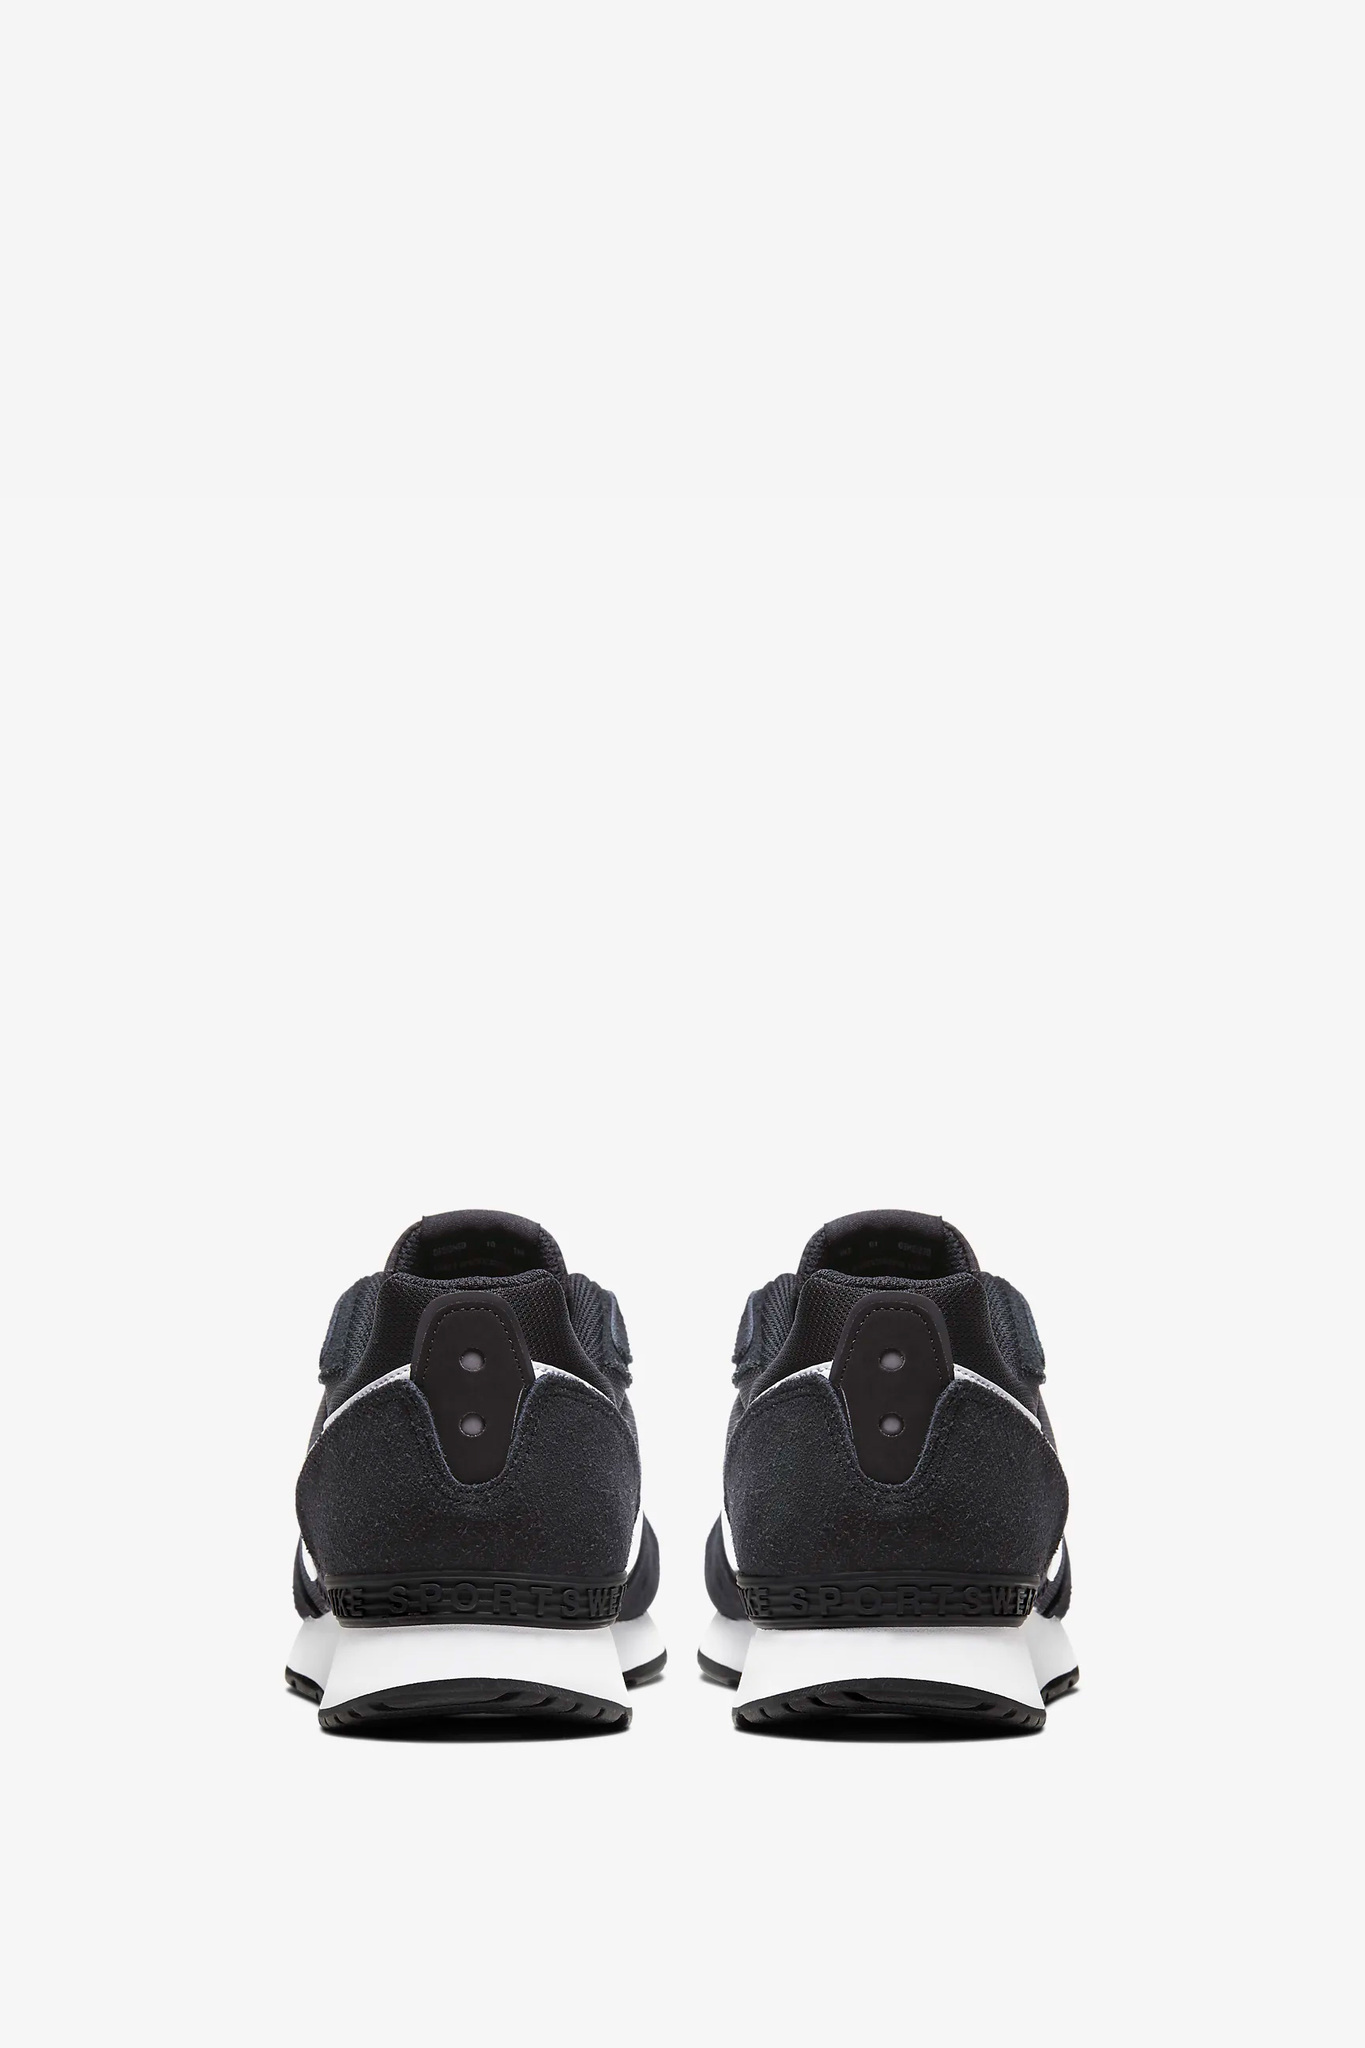 Купить Nike Venture Runner CK2944-002 219361700-4567